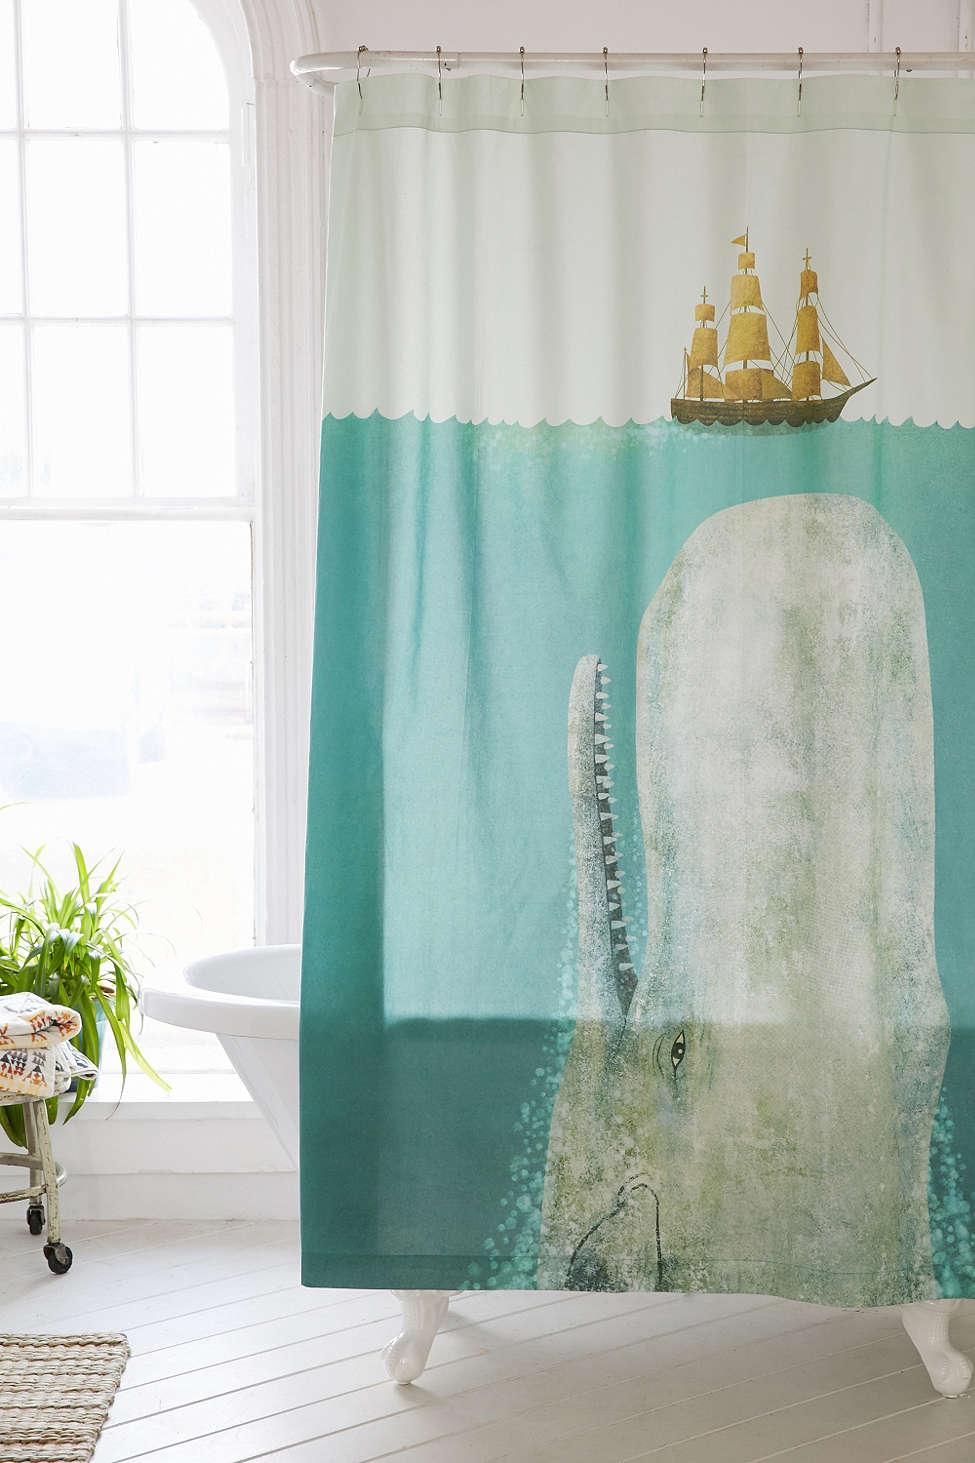 diy shower curtain art house of jade